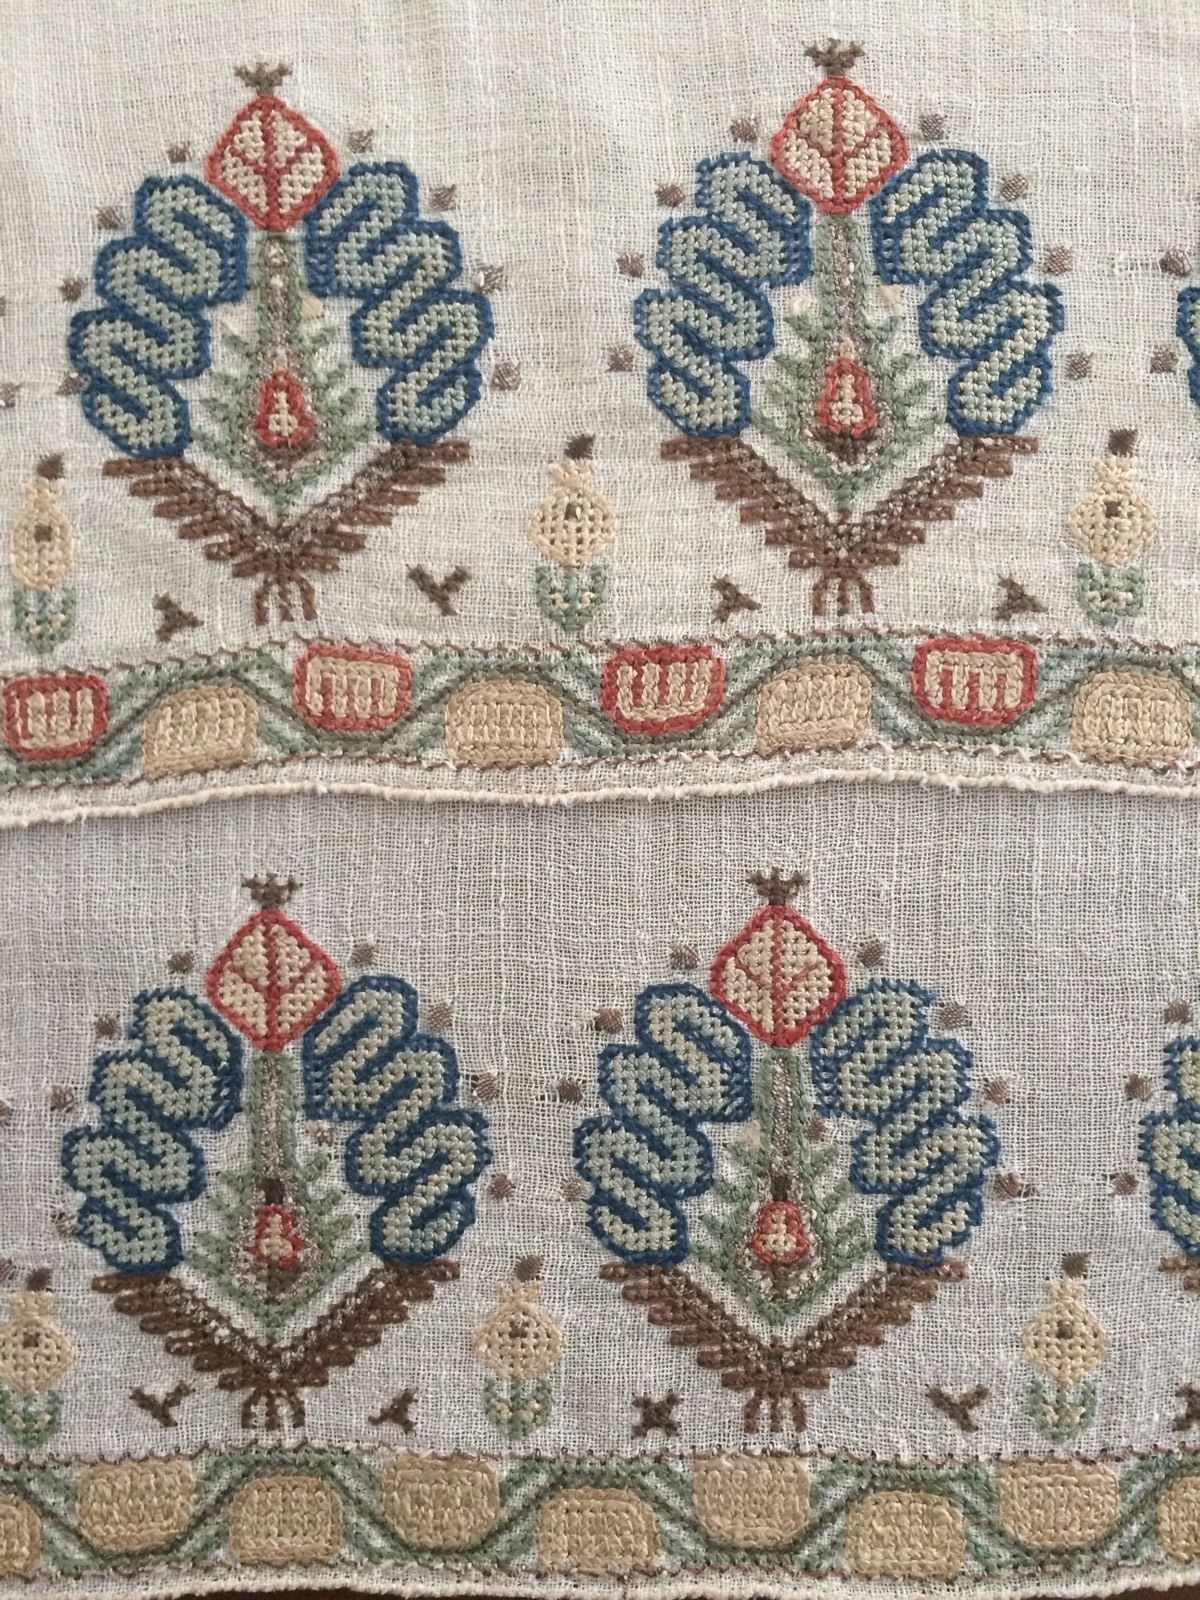 19th C Antique Ottoman Turkish Hand Embroidery On Linen Yaglik